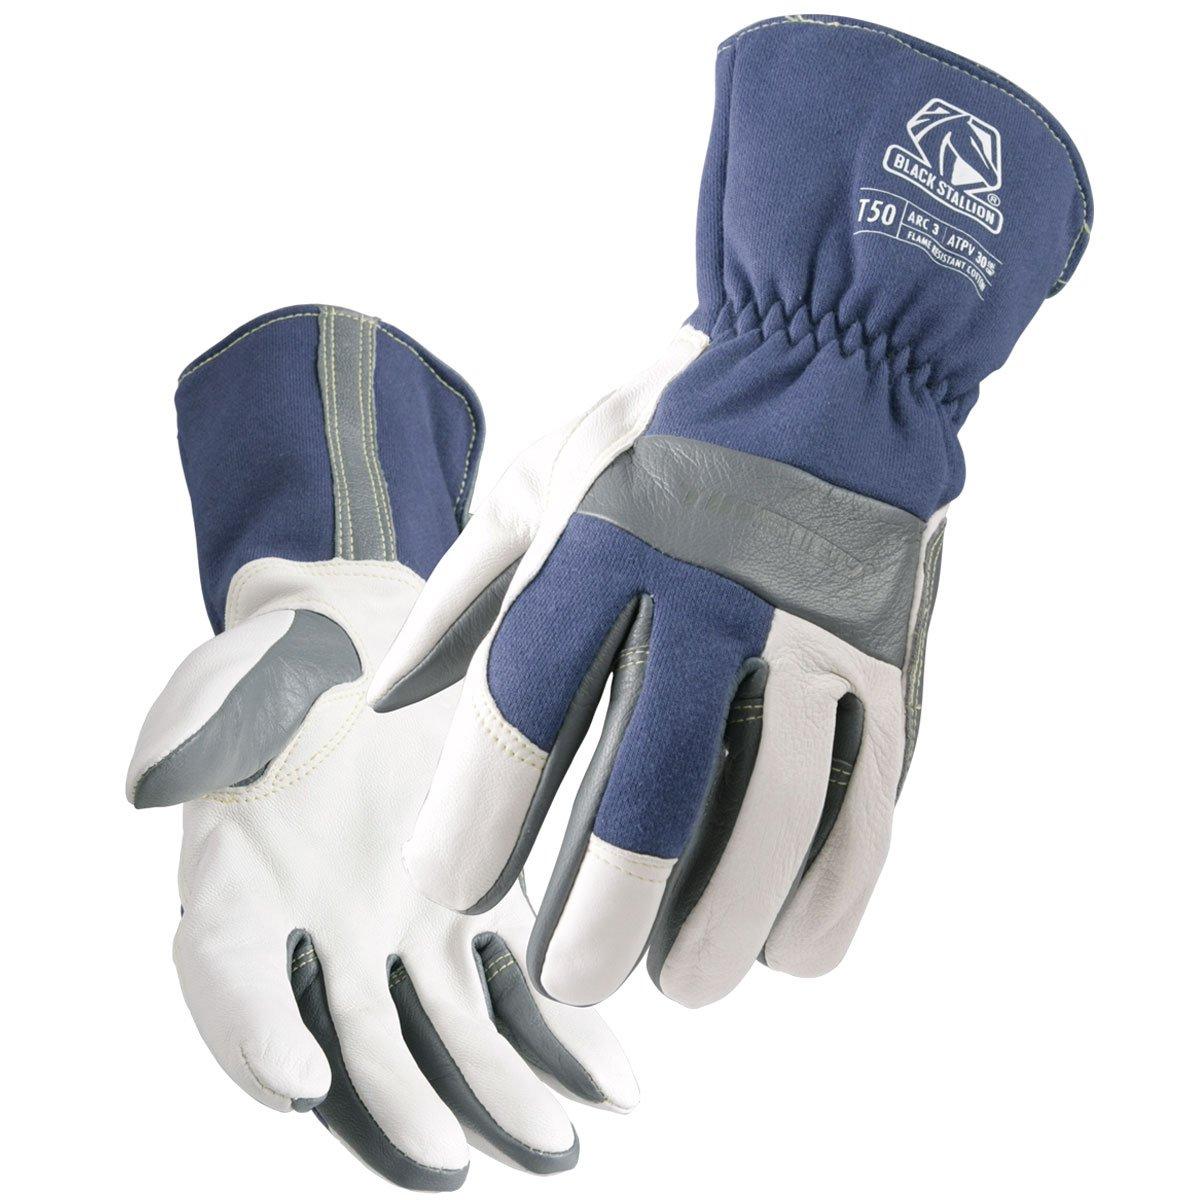 Revco TIGSTER8482;''The Ultimate TIG Welding Glove'' - Model: T50-SIZE L Size: L